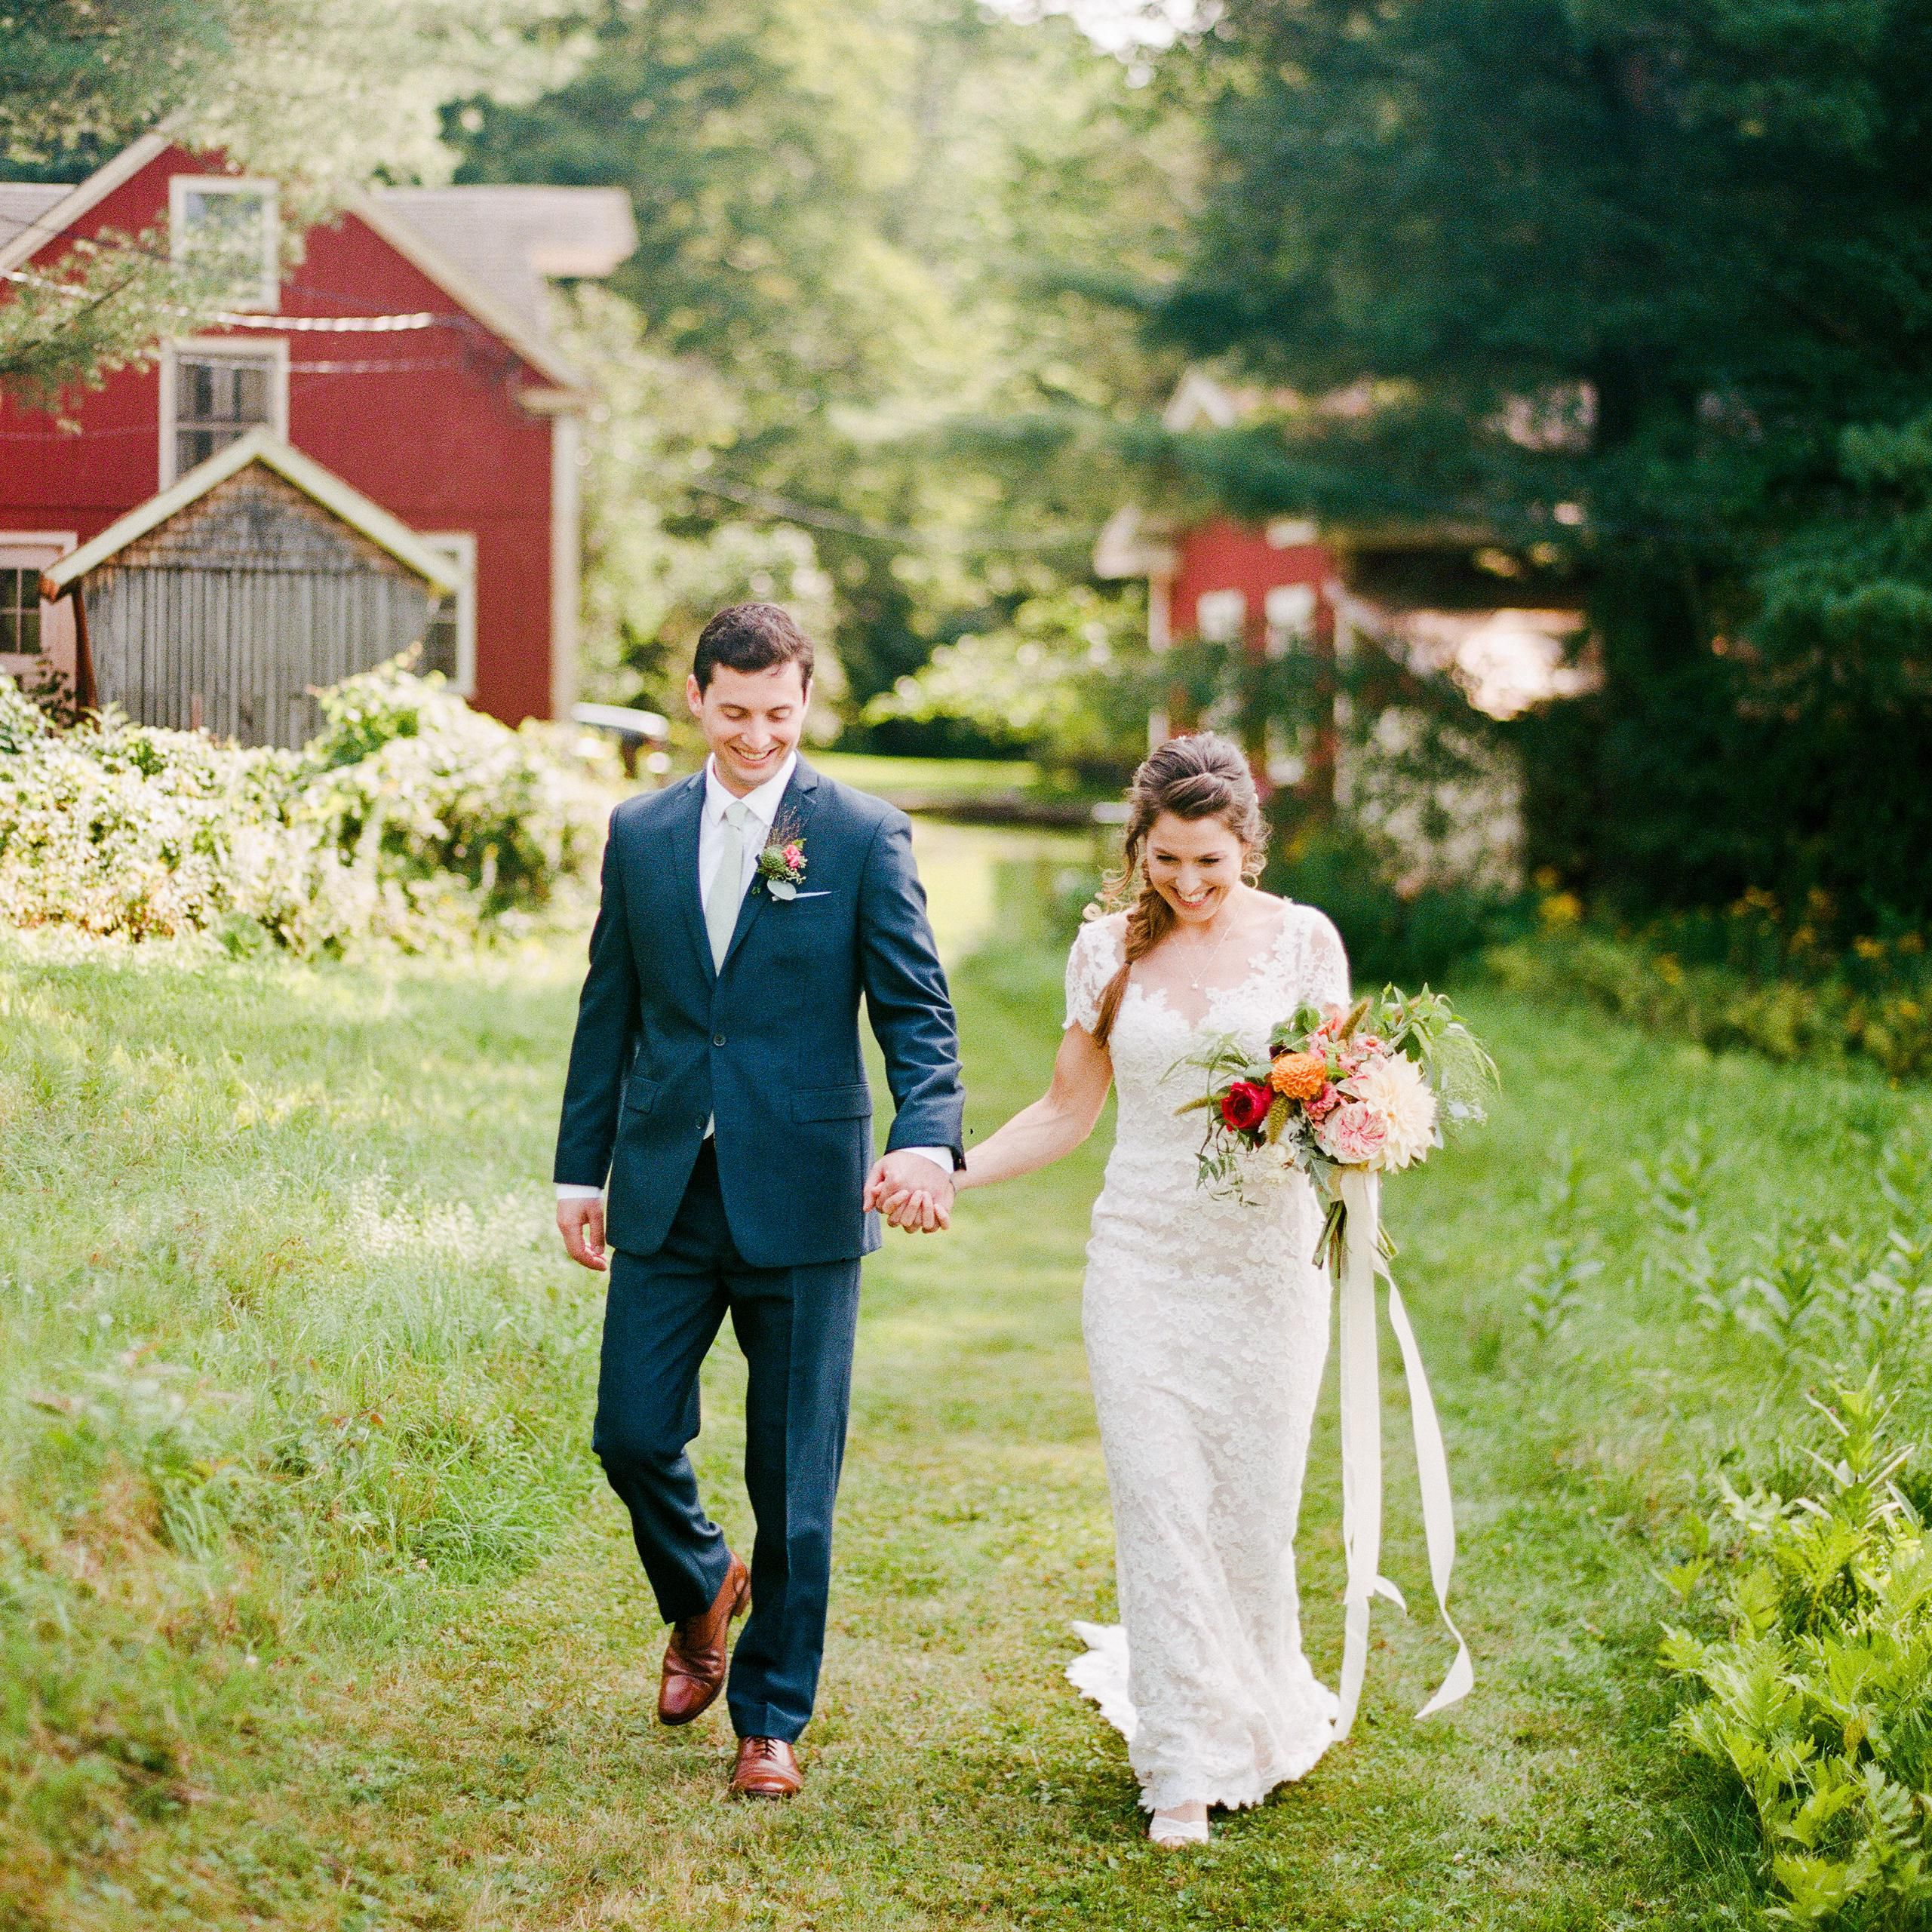 14 Ways To Host An Elegant Farm Wedding,Beach Wedding Dresses Australia Online